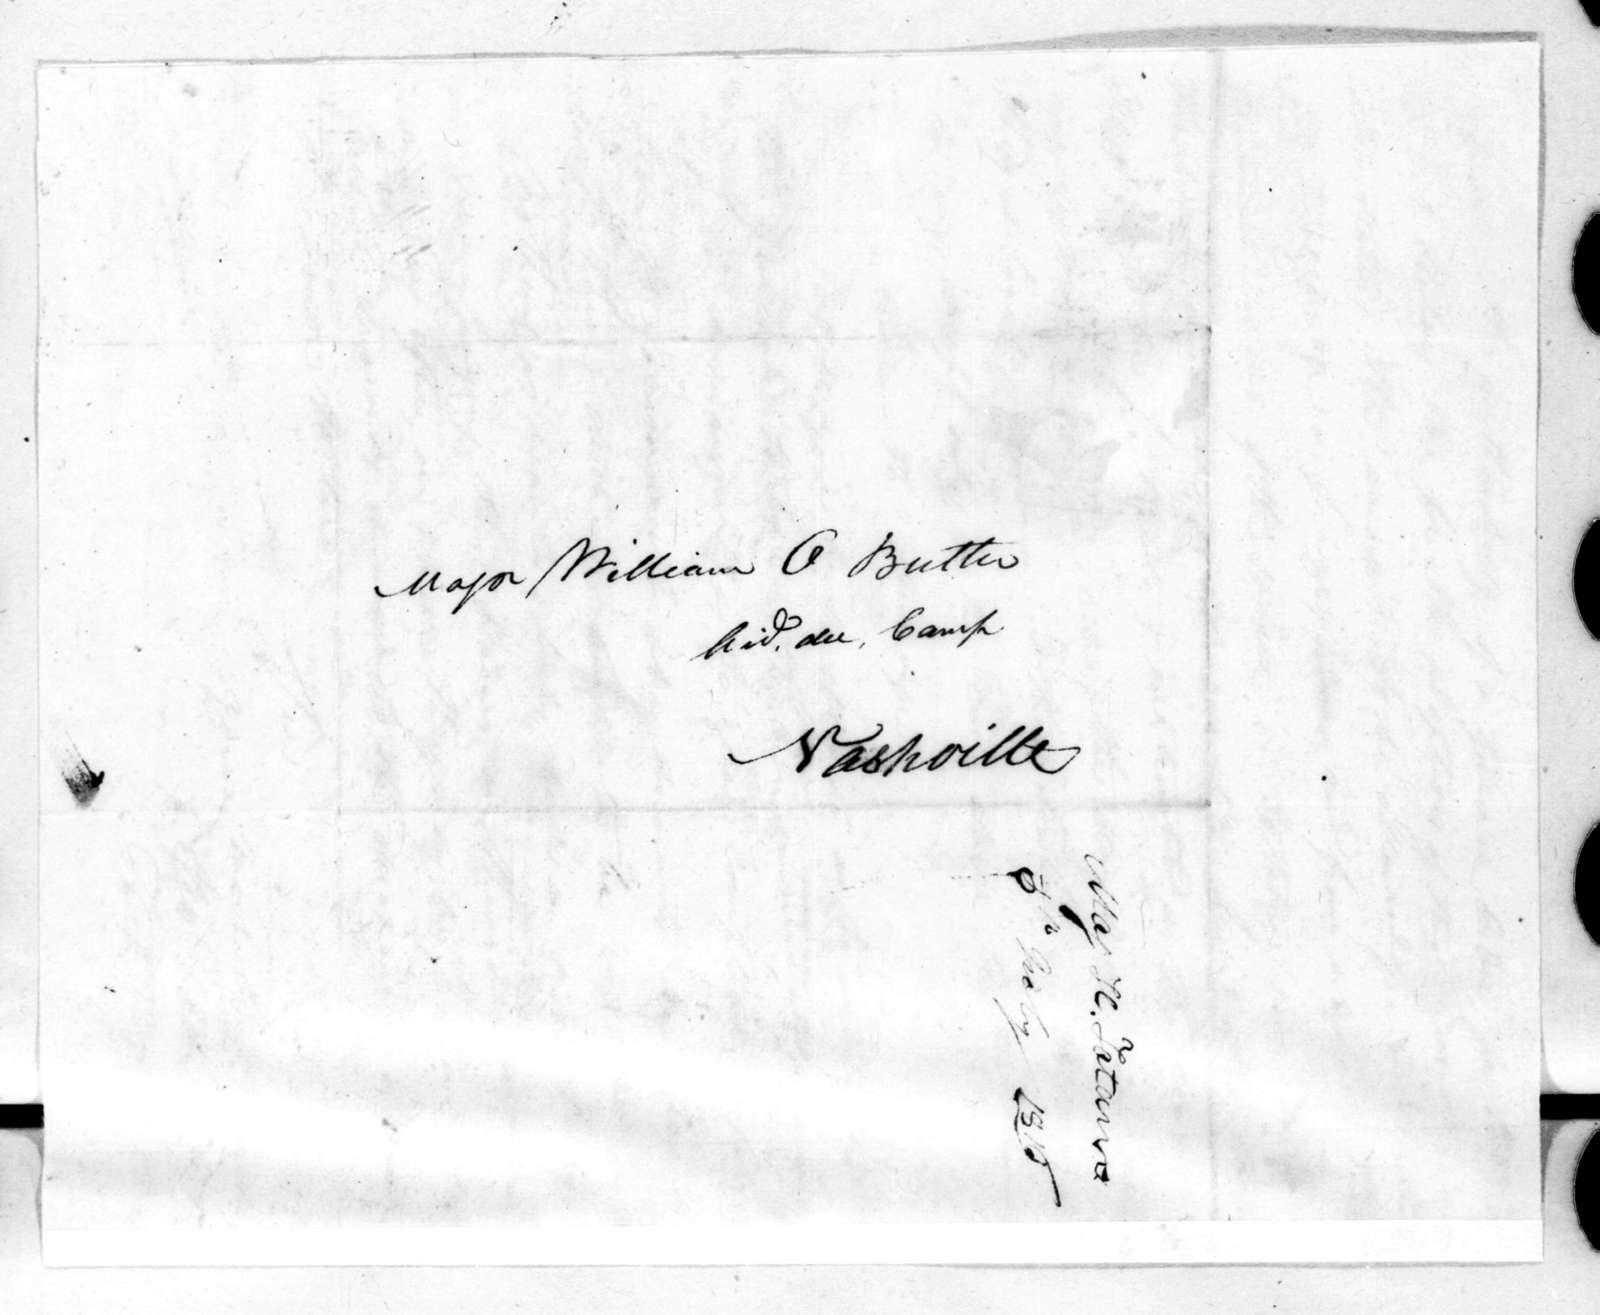 Howell Tatum to William Orlando Butler, July 5, 1816